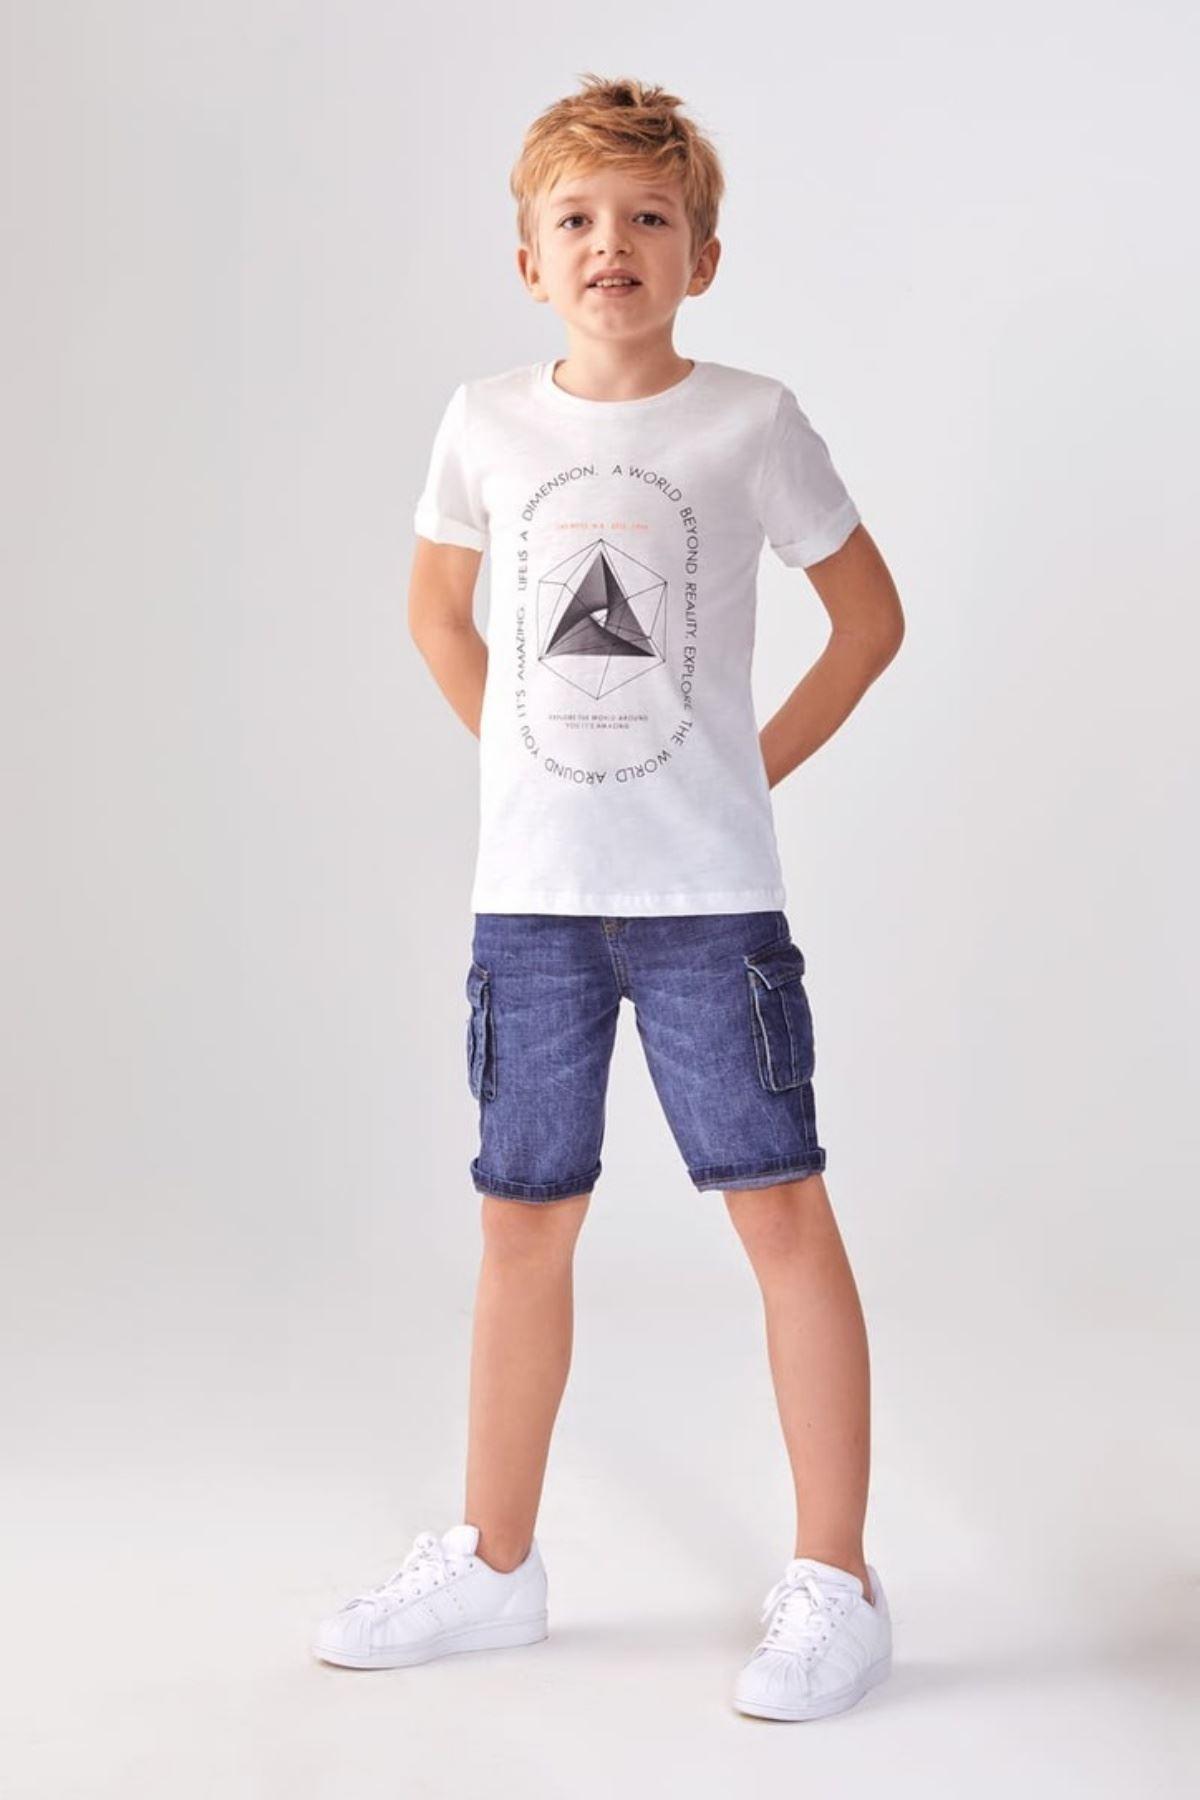 Boyut Erkek Çocuk T-shirt